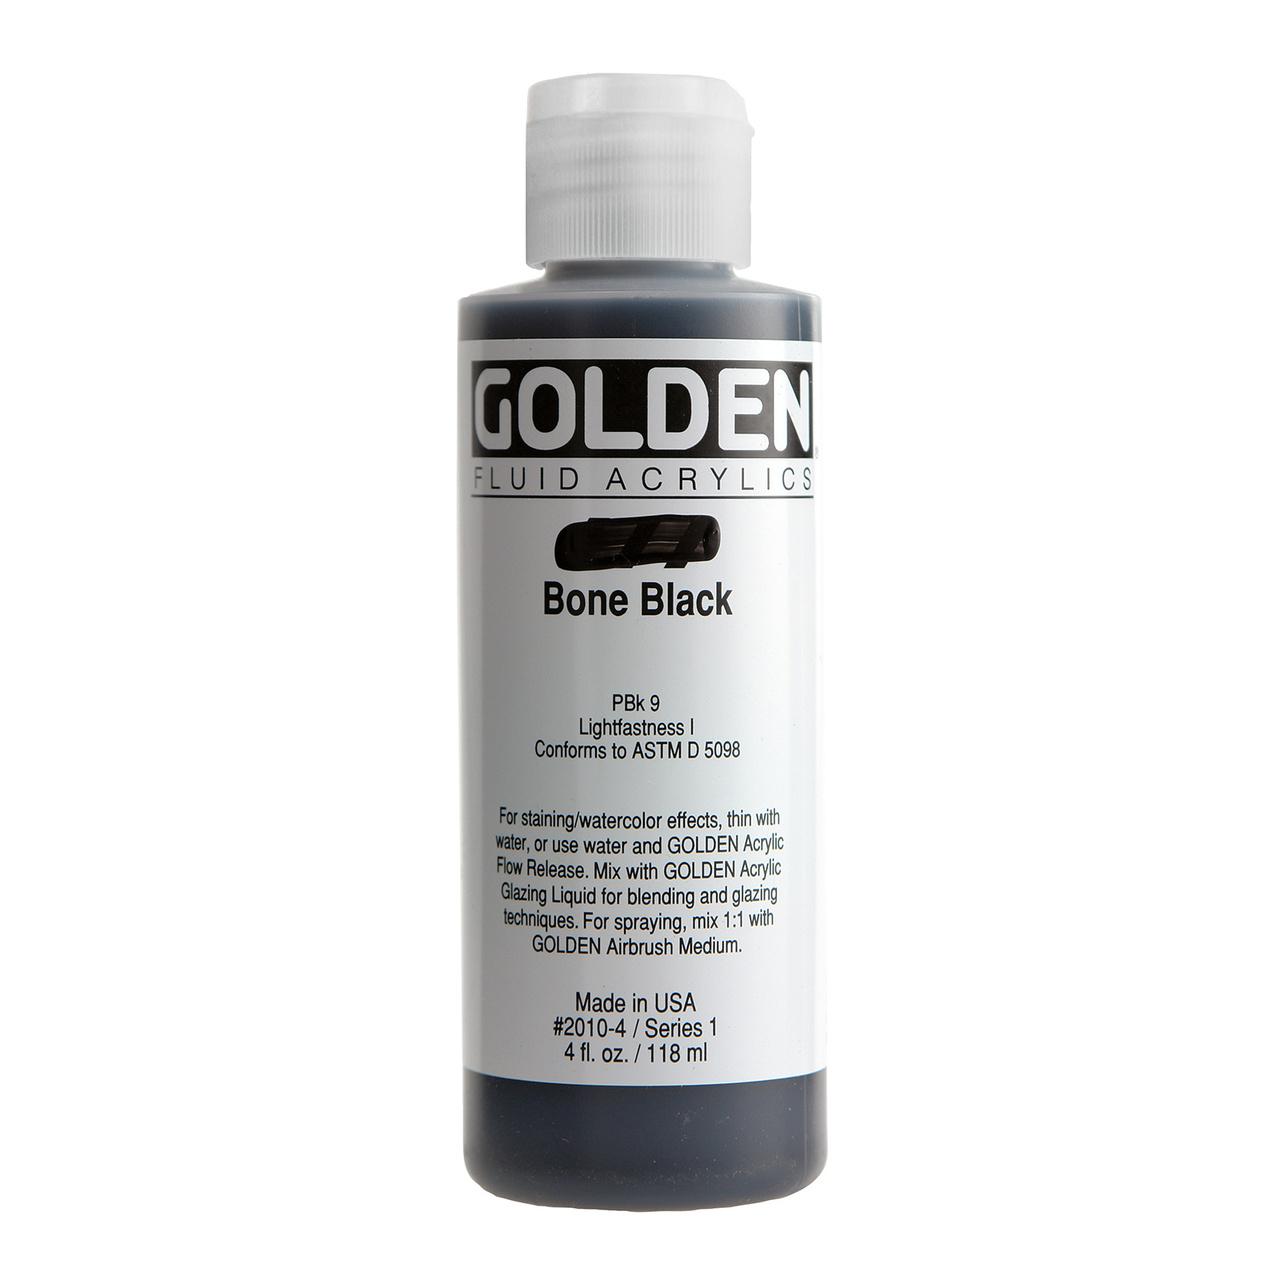 FLUID ACRYLIC 4OZ BONE BLACK